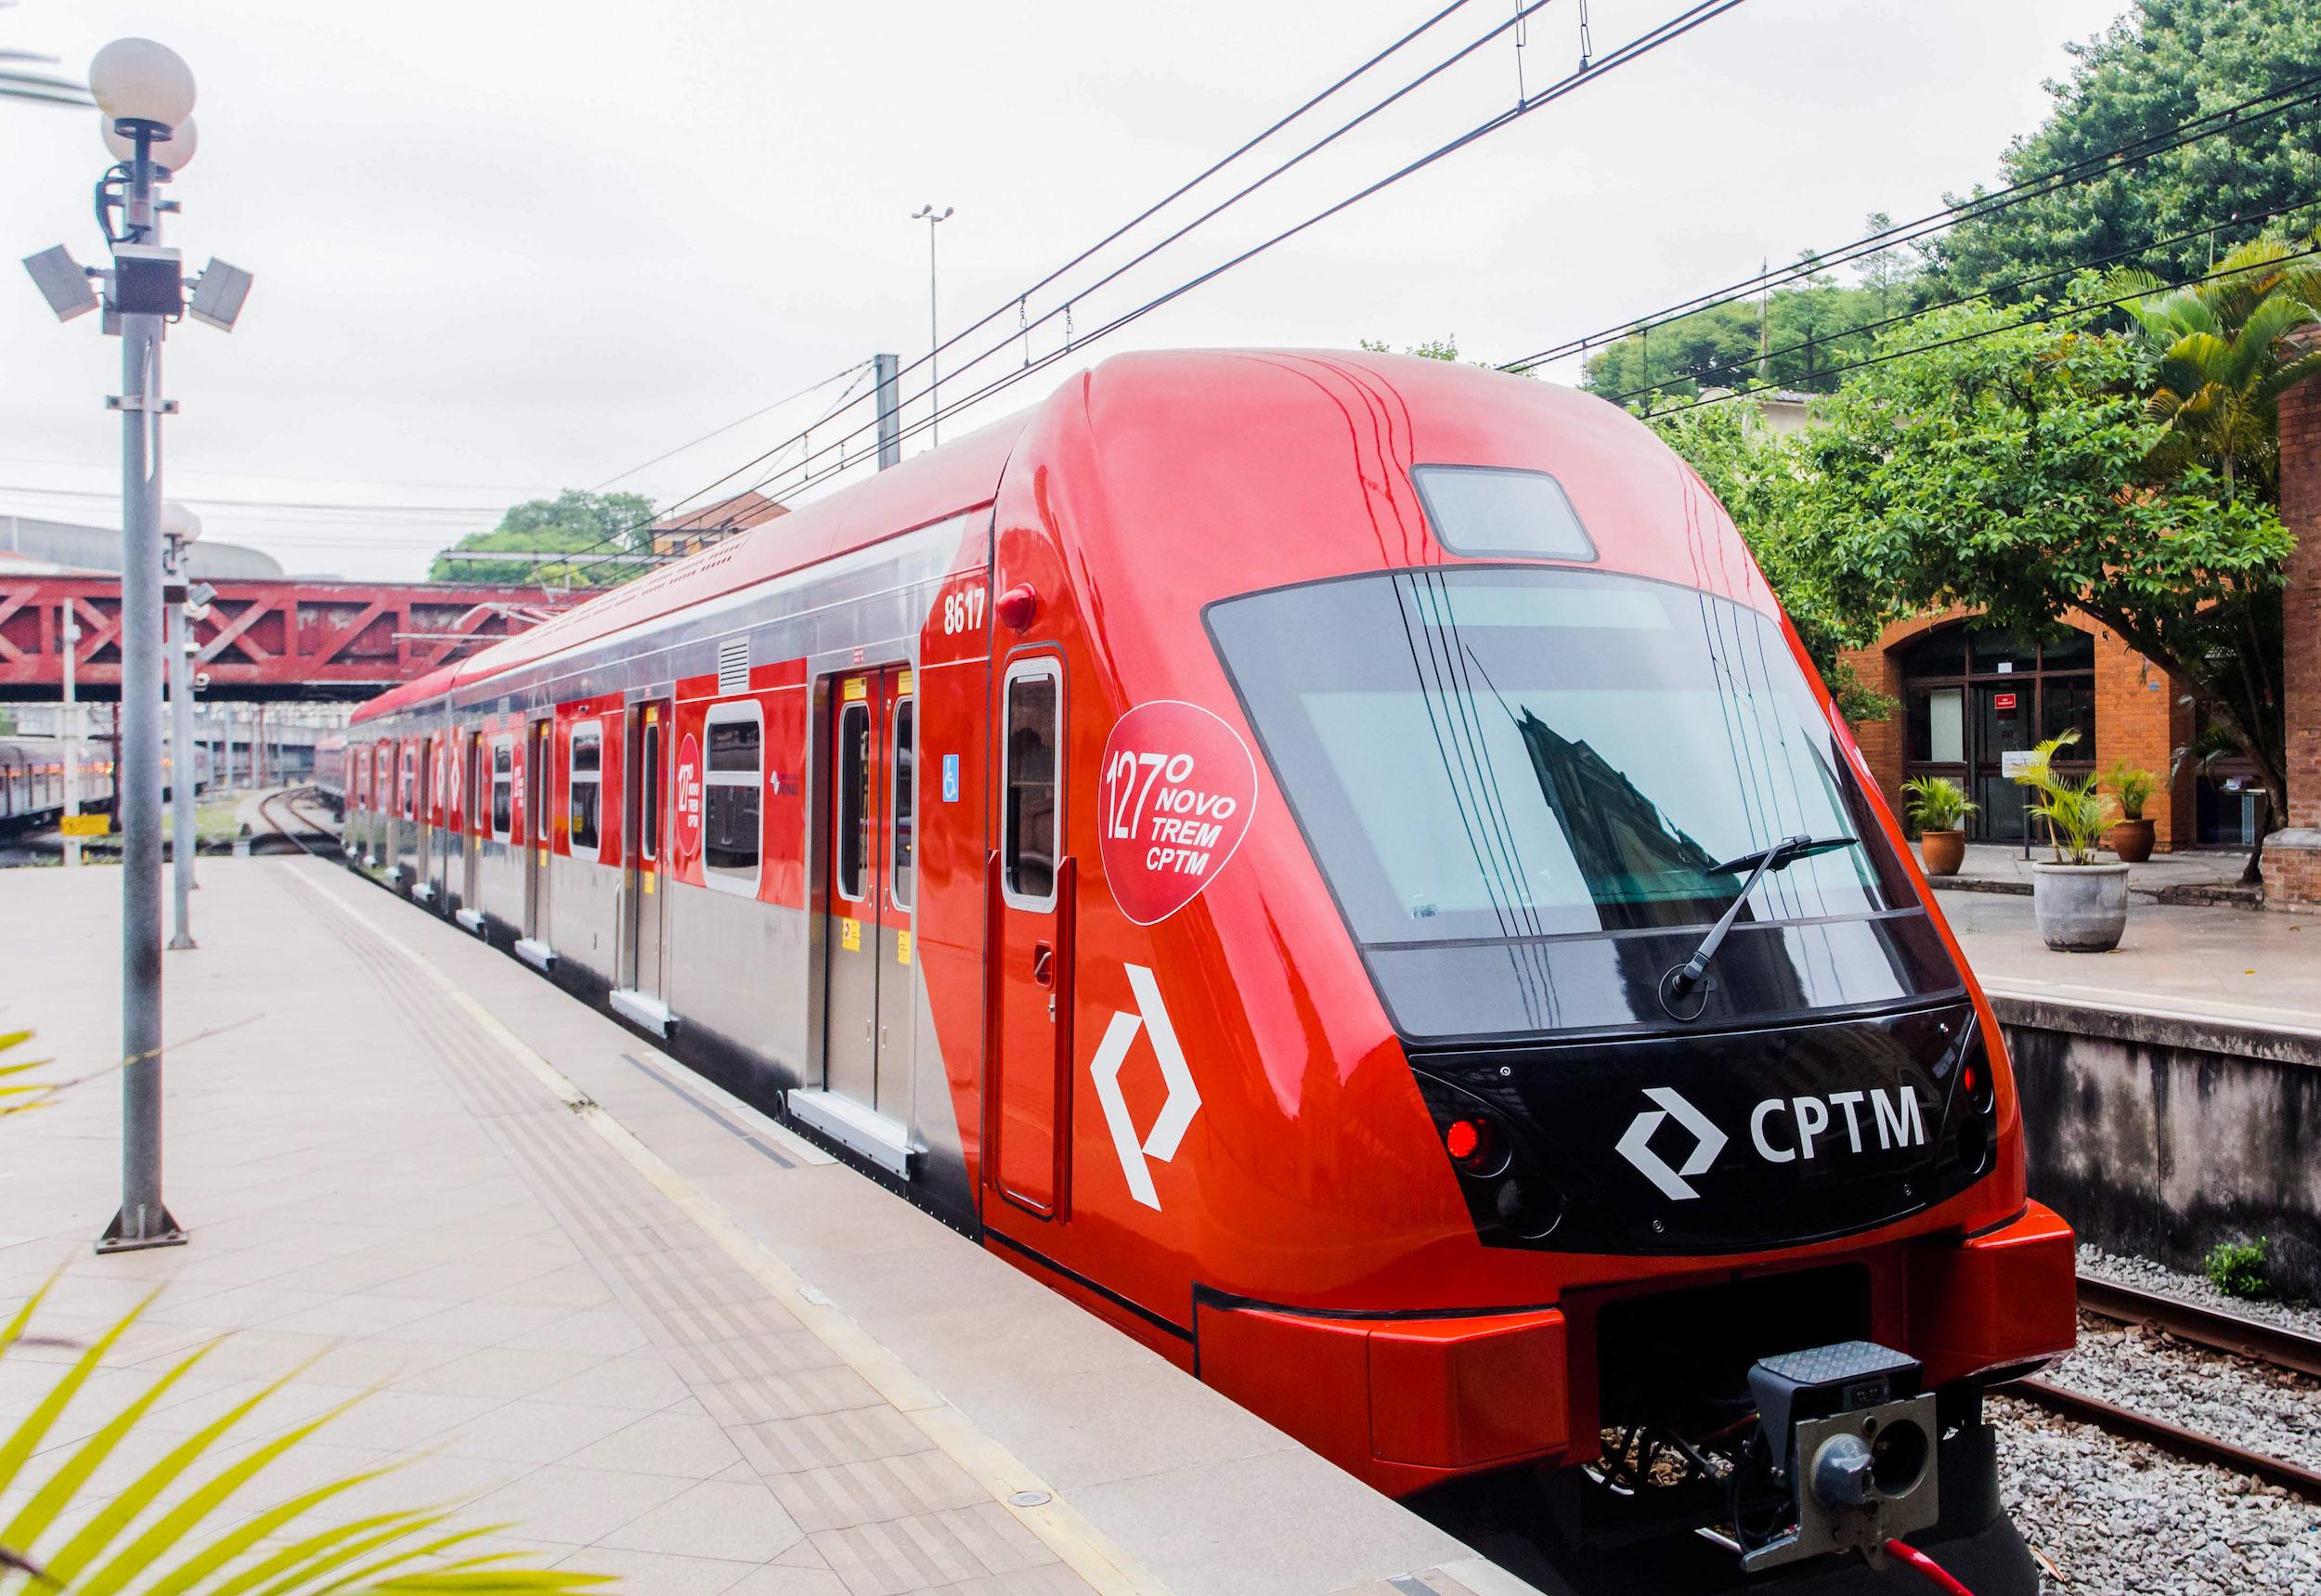 CPTM (Metropolitan Train Company)